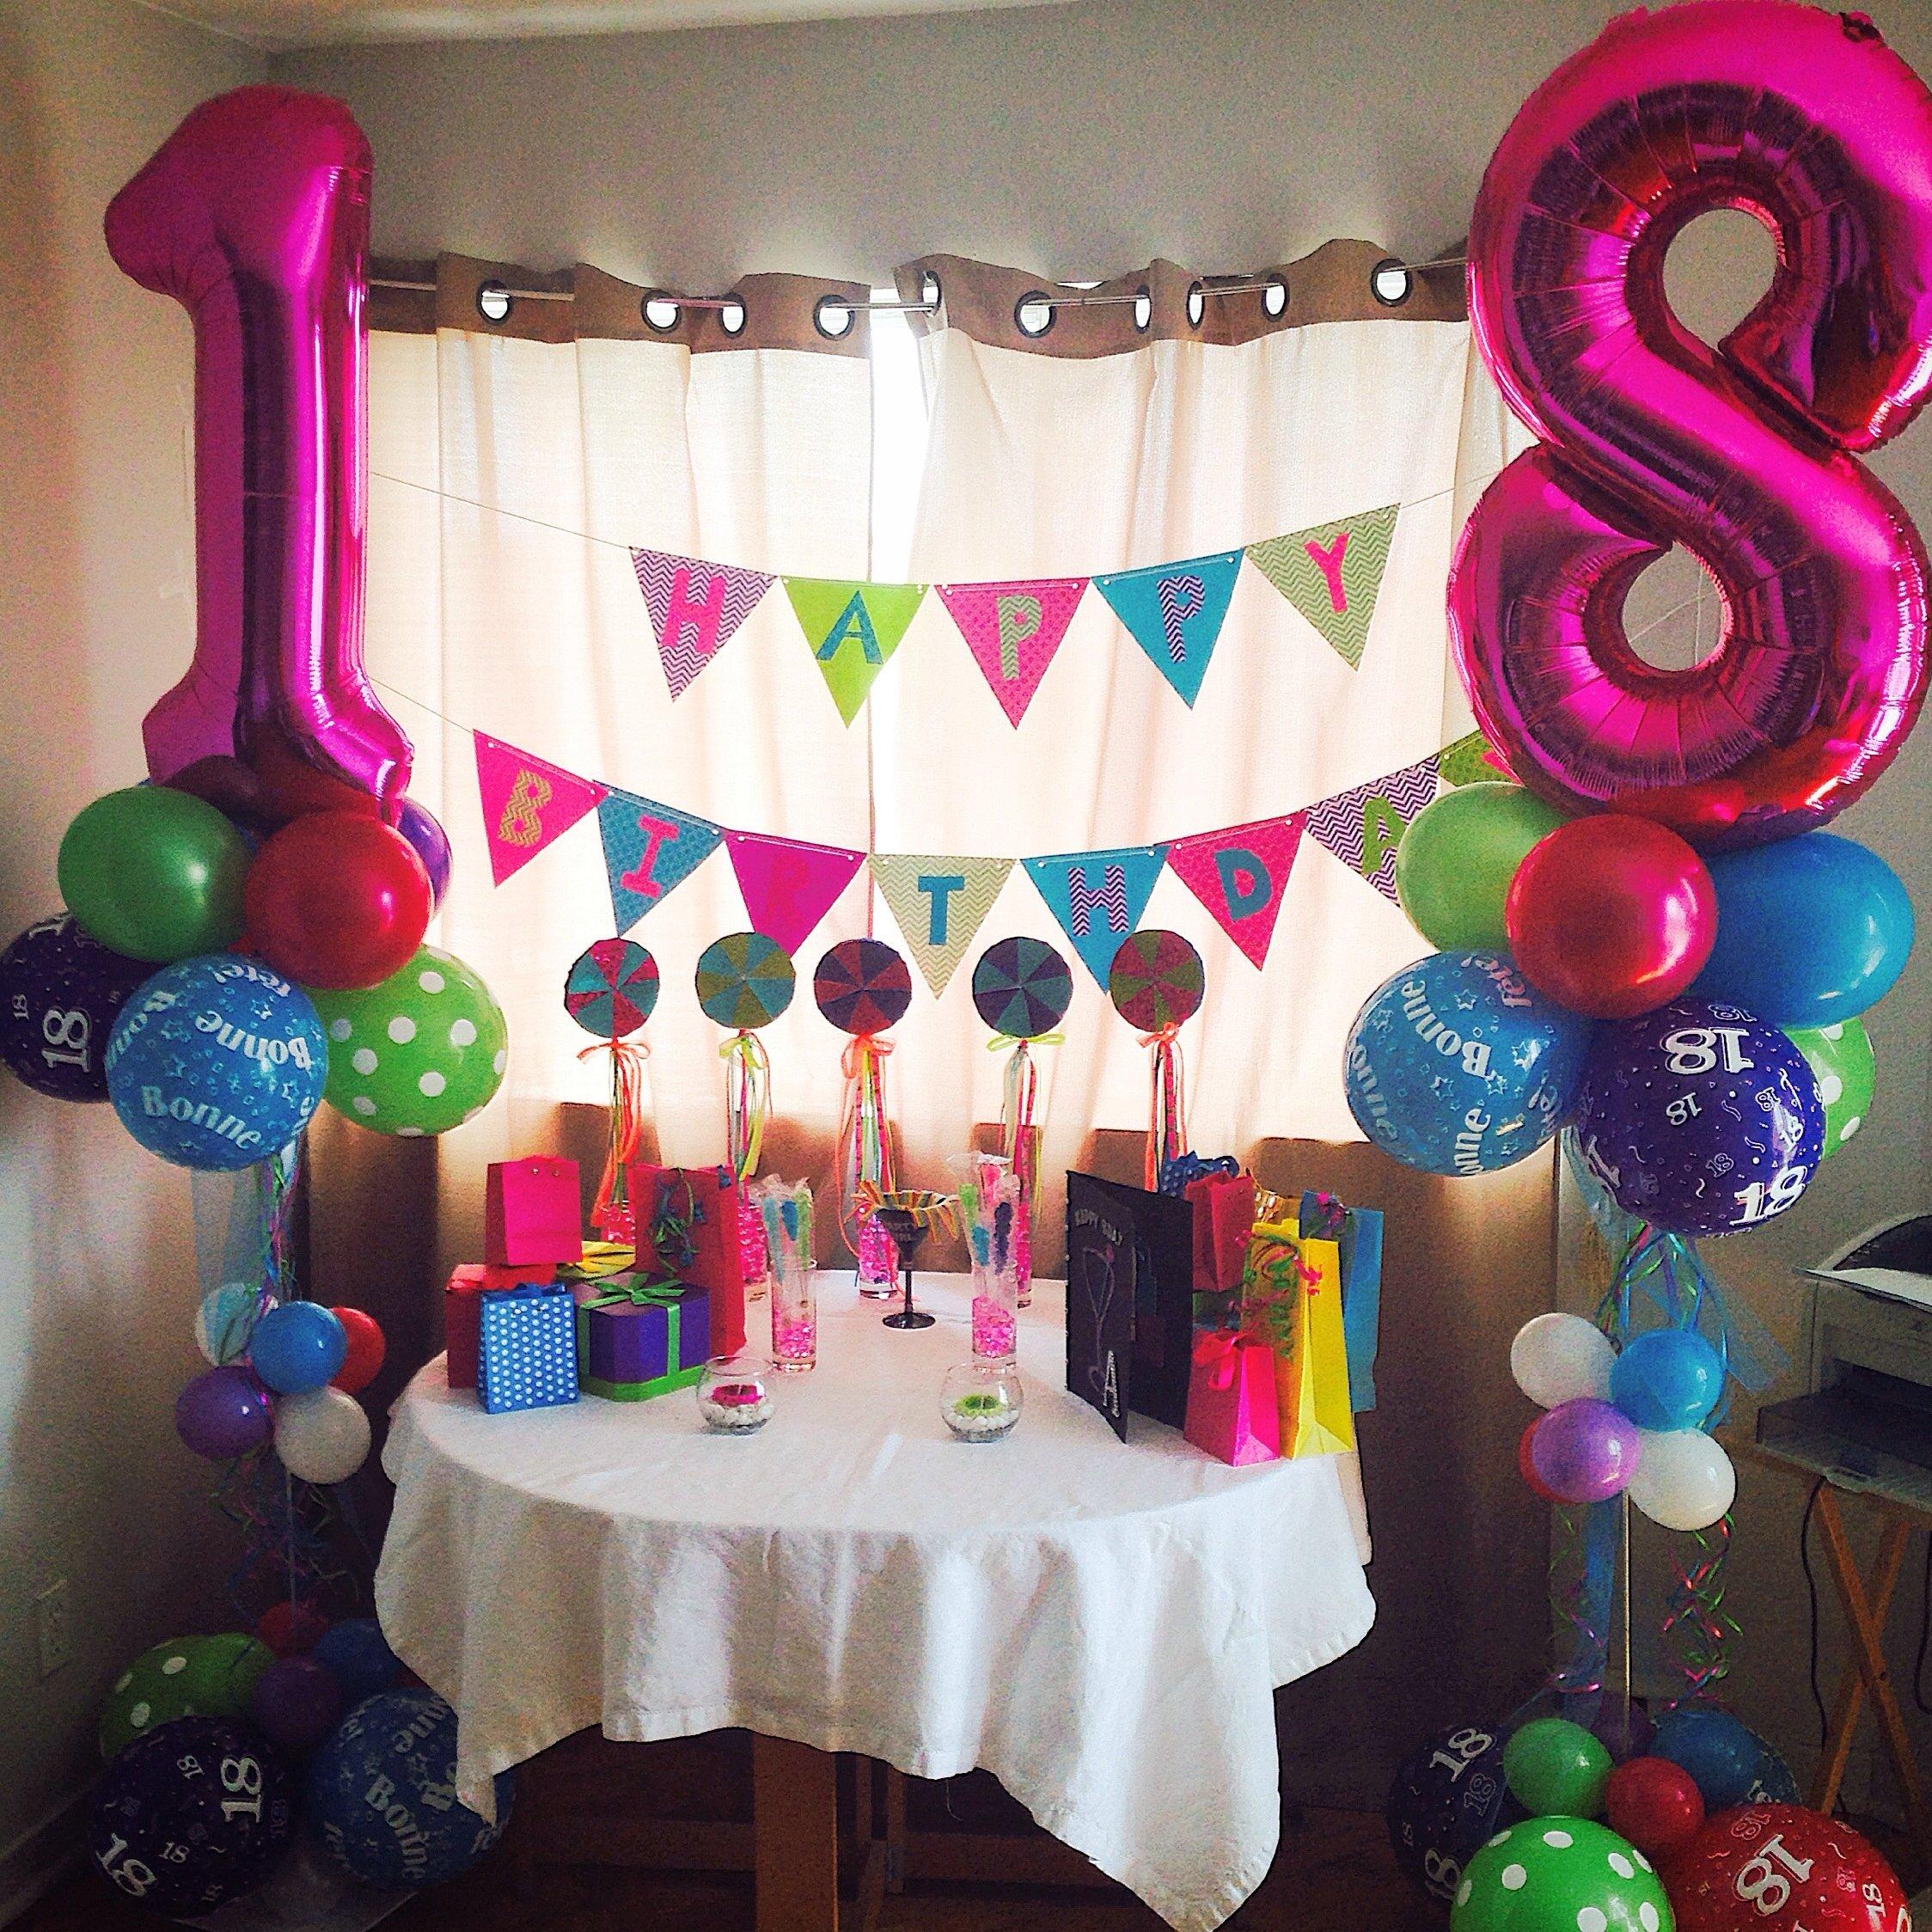 10 Great Crazy 18Th Birthday Party Ideas pinzerina cizmic on birthday gifts pinterest balloon shop 2021